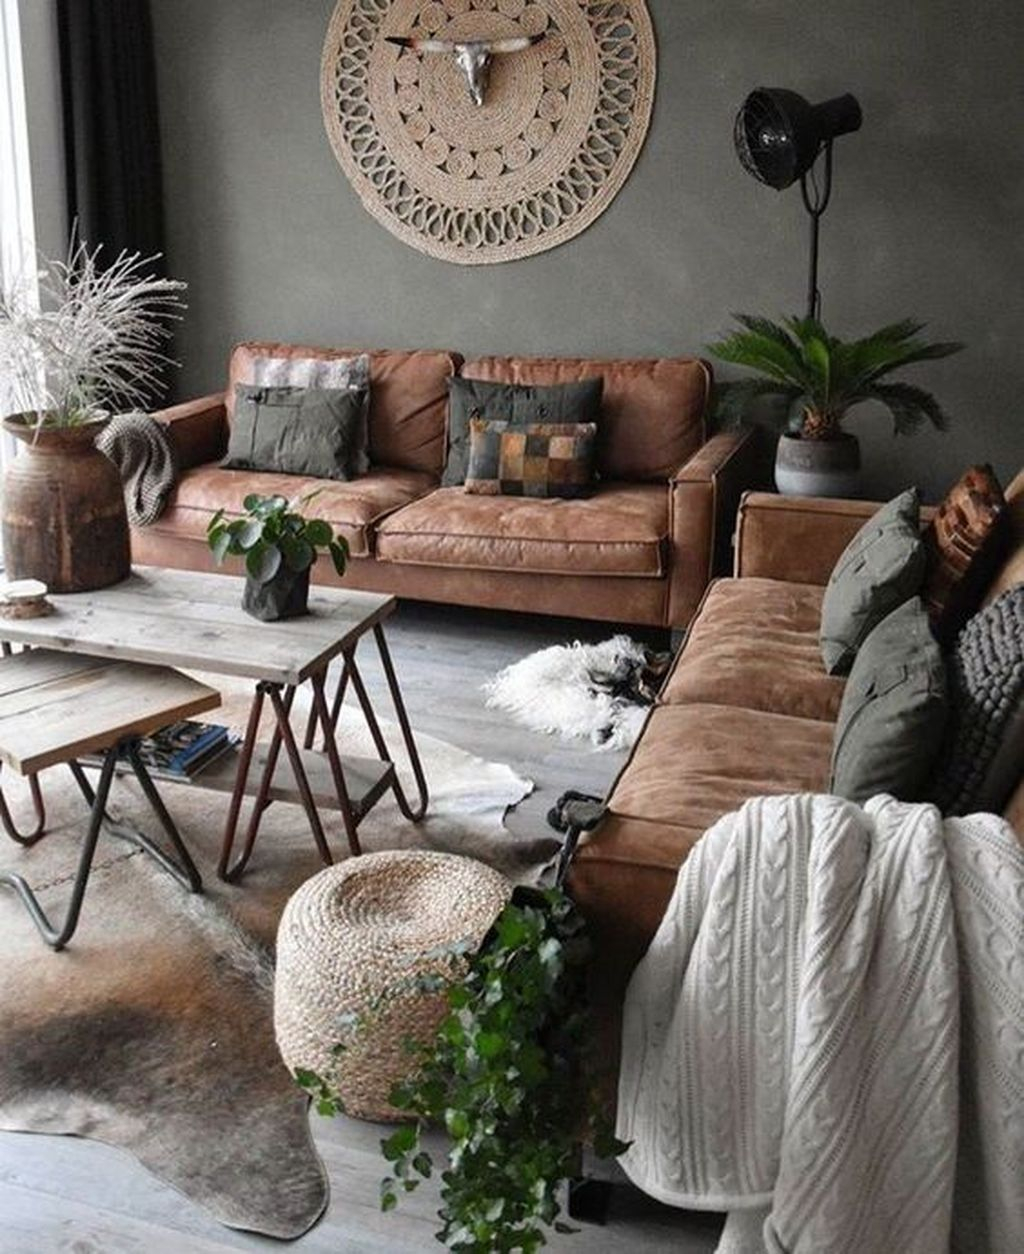 Enchanting Living Room Decor Ideas That Trending This Winter 26